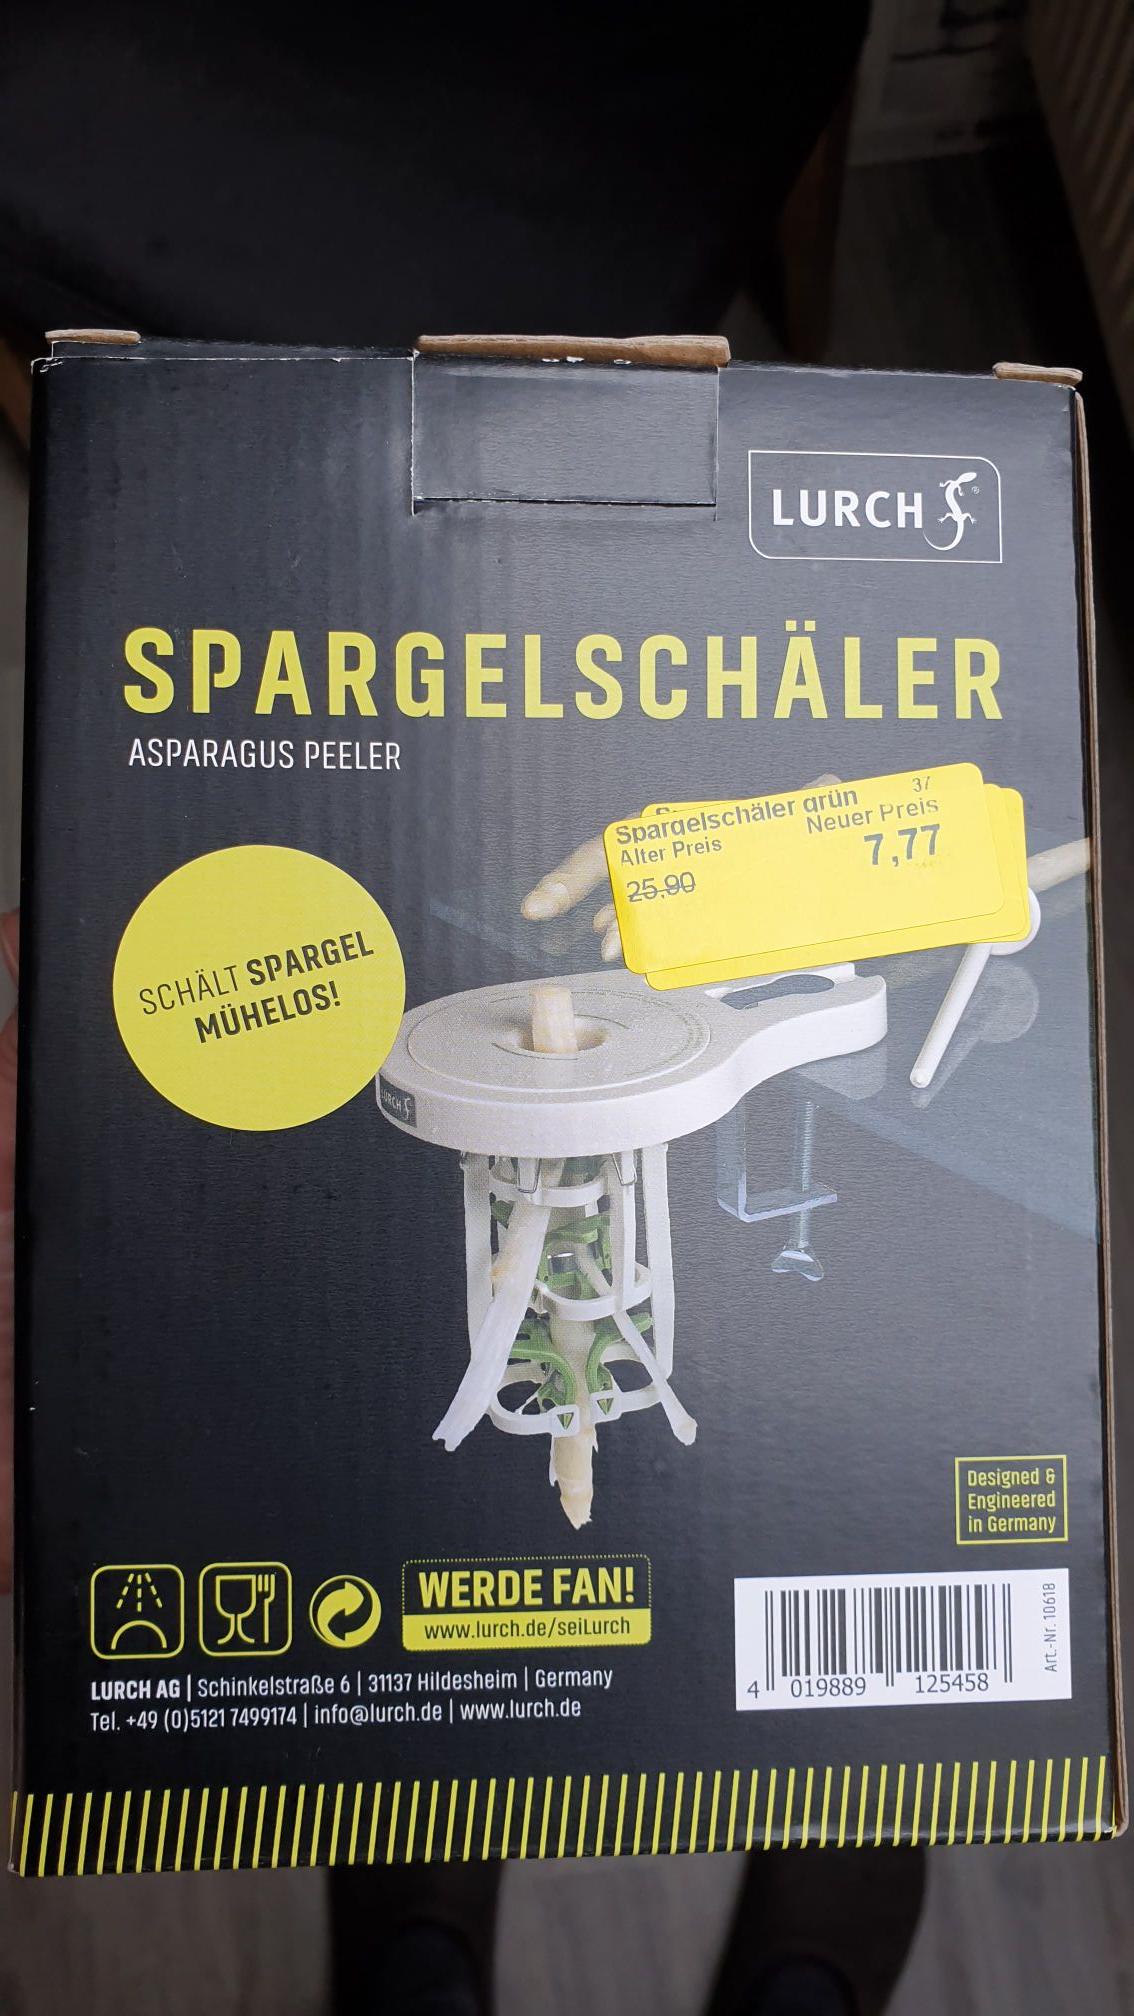 Lurch Spargelschäler Lokal Famila in Vechta